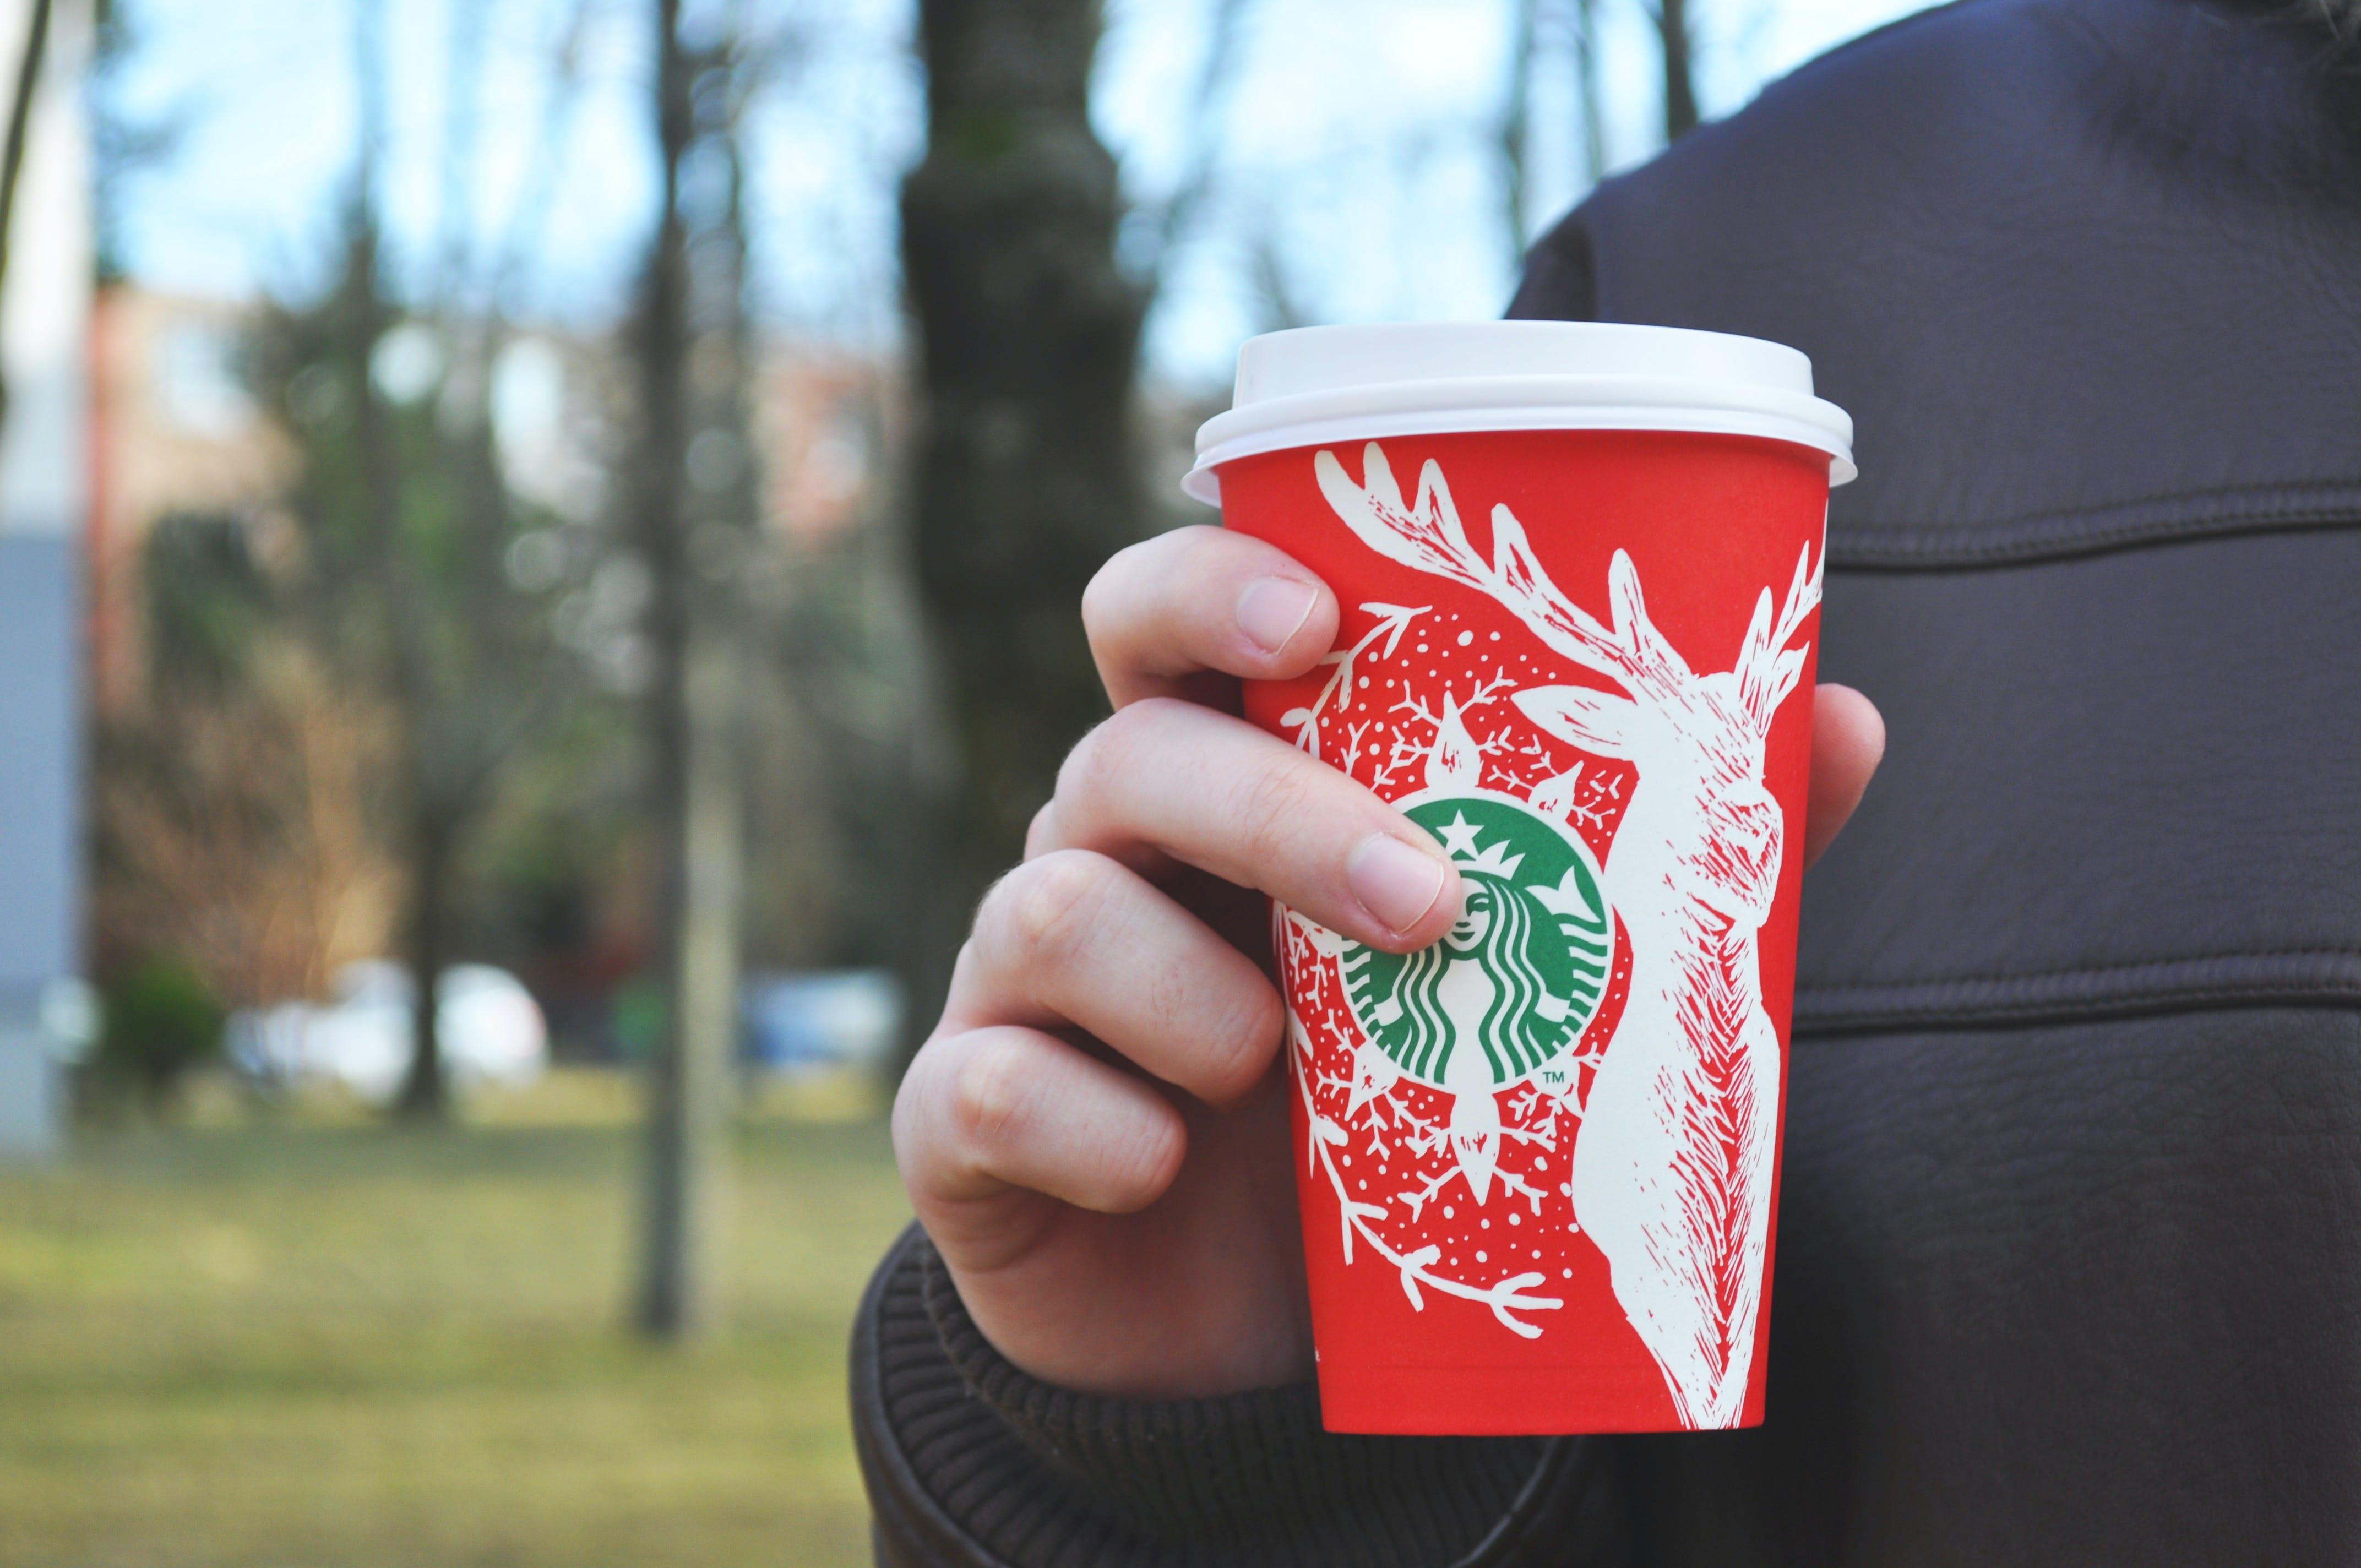 Person Holding Starbucks Disposable Tumbler